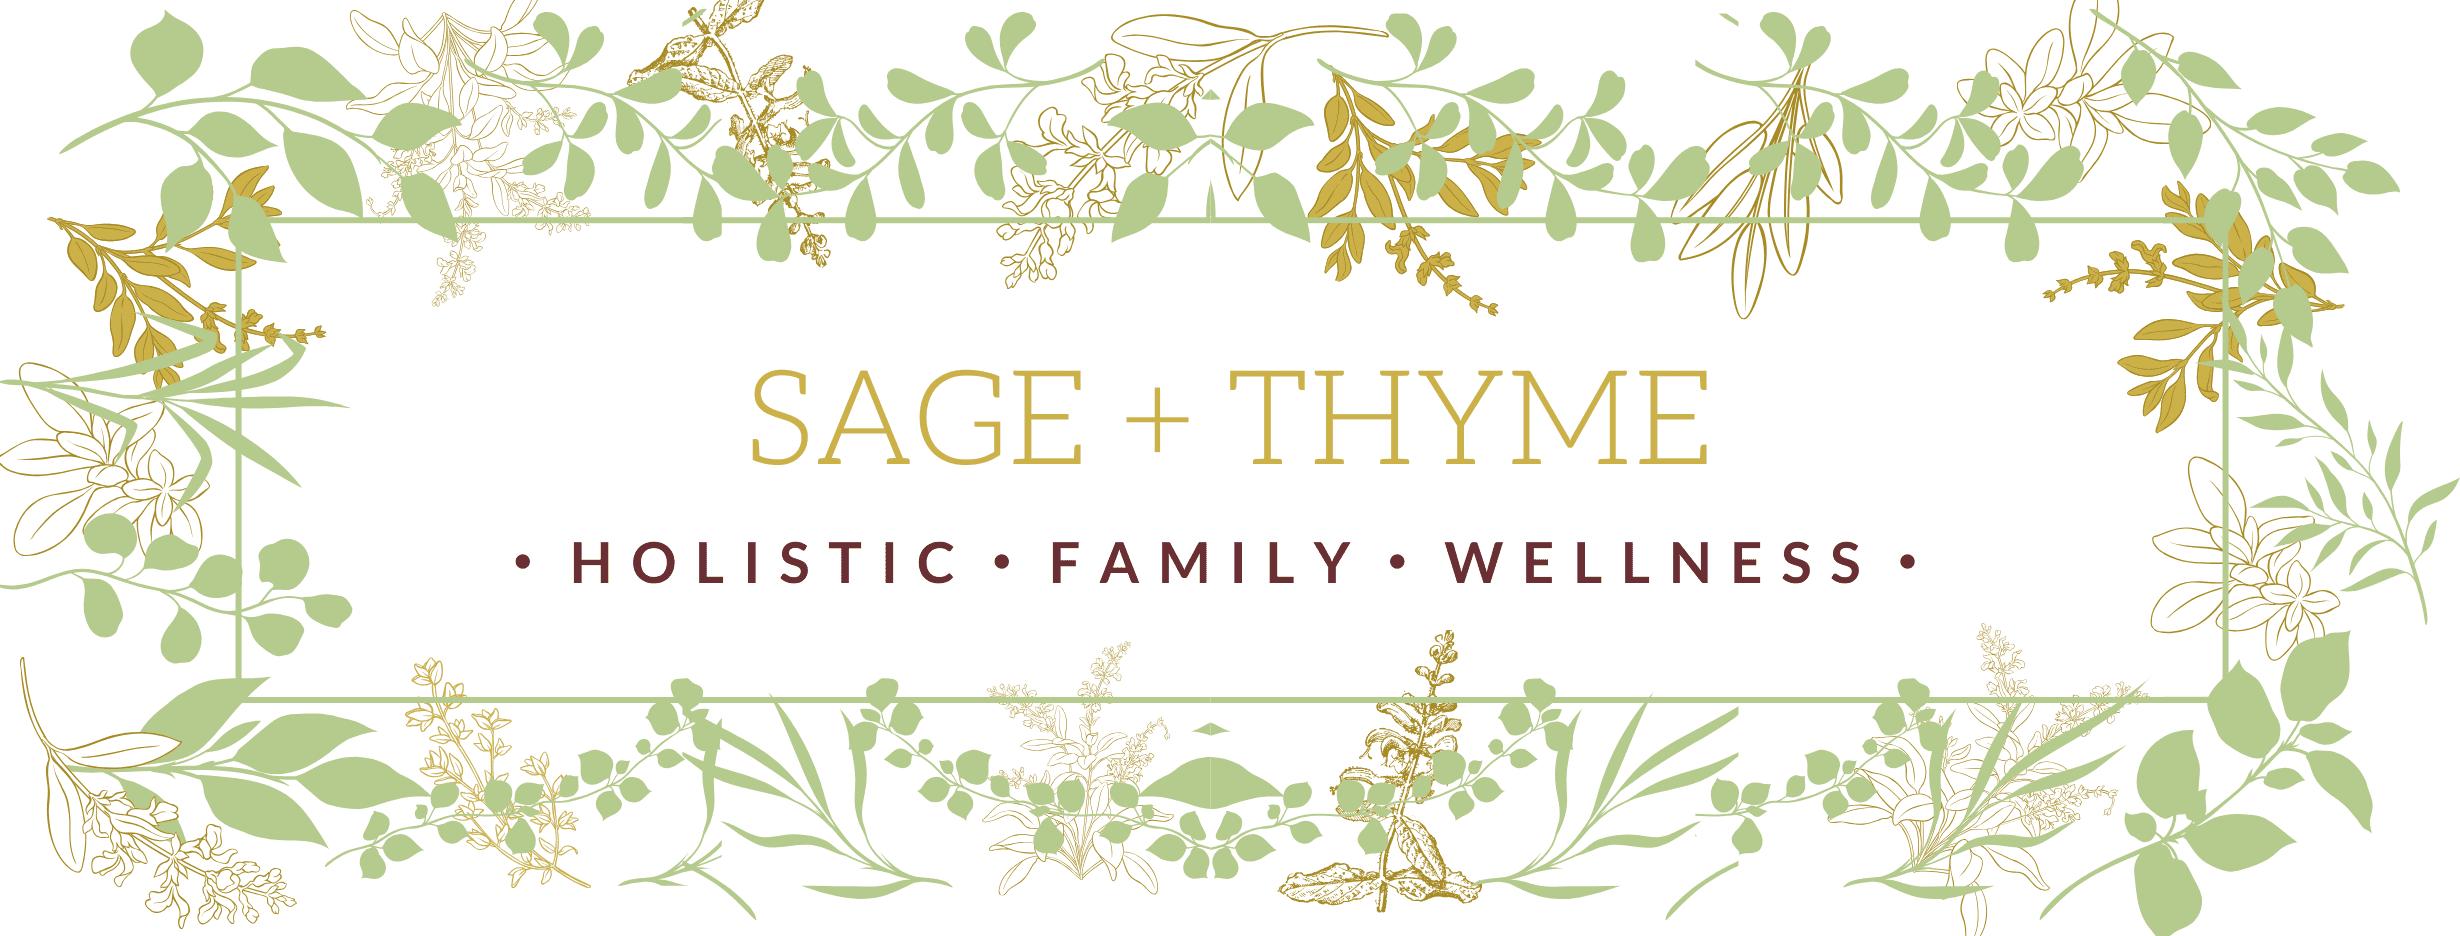 Sage and Thyme Wellness